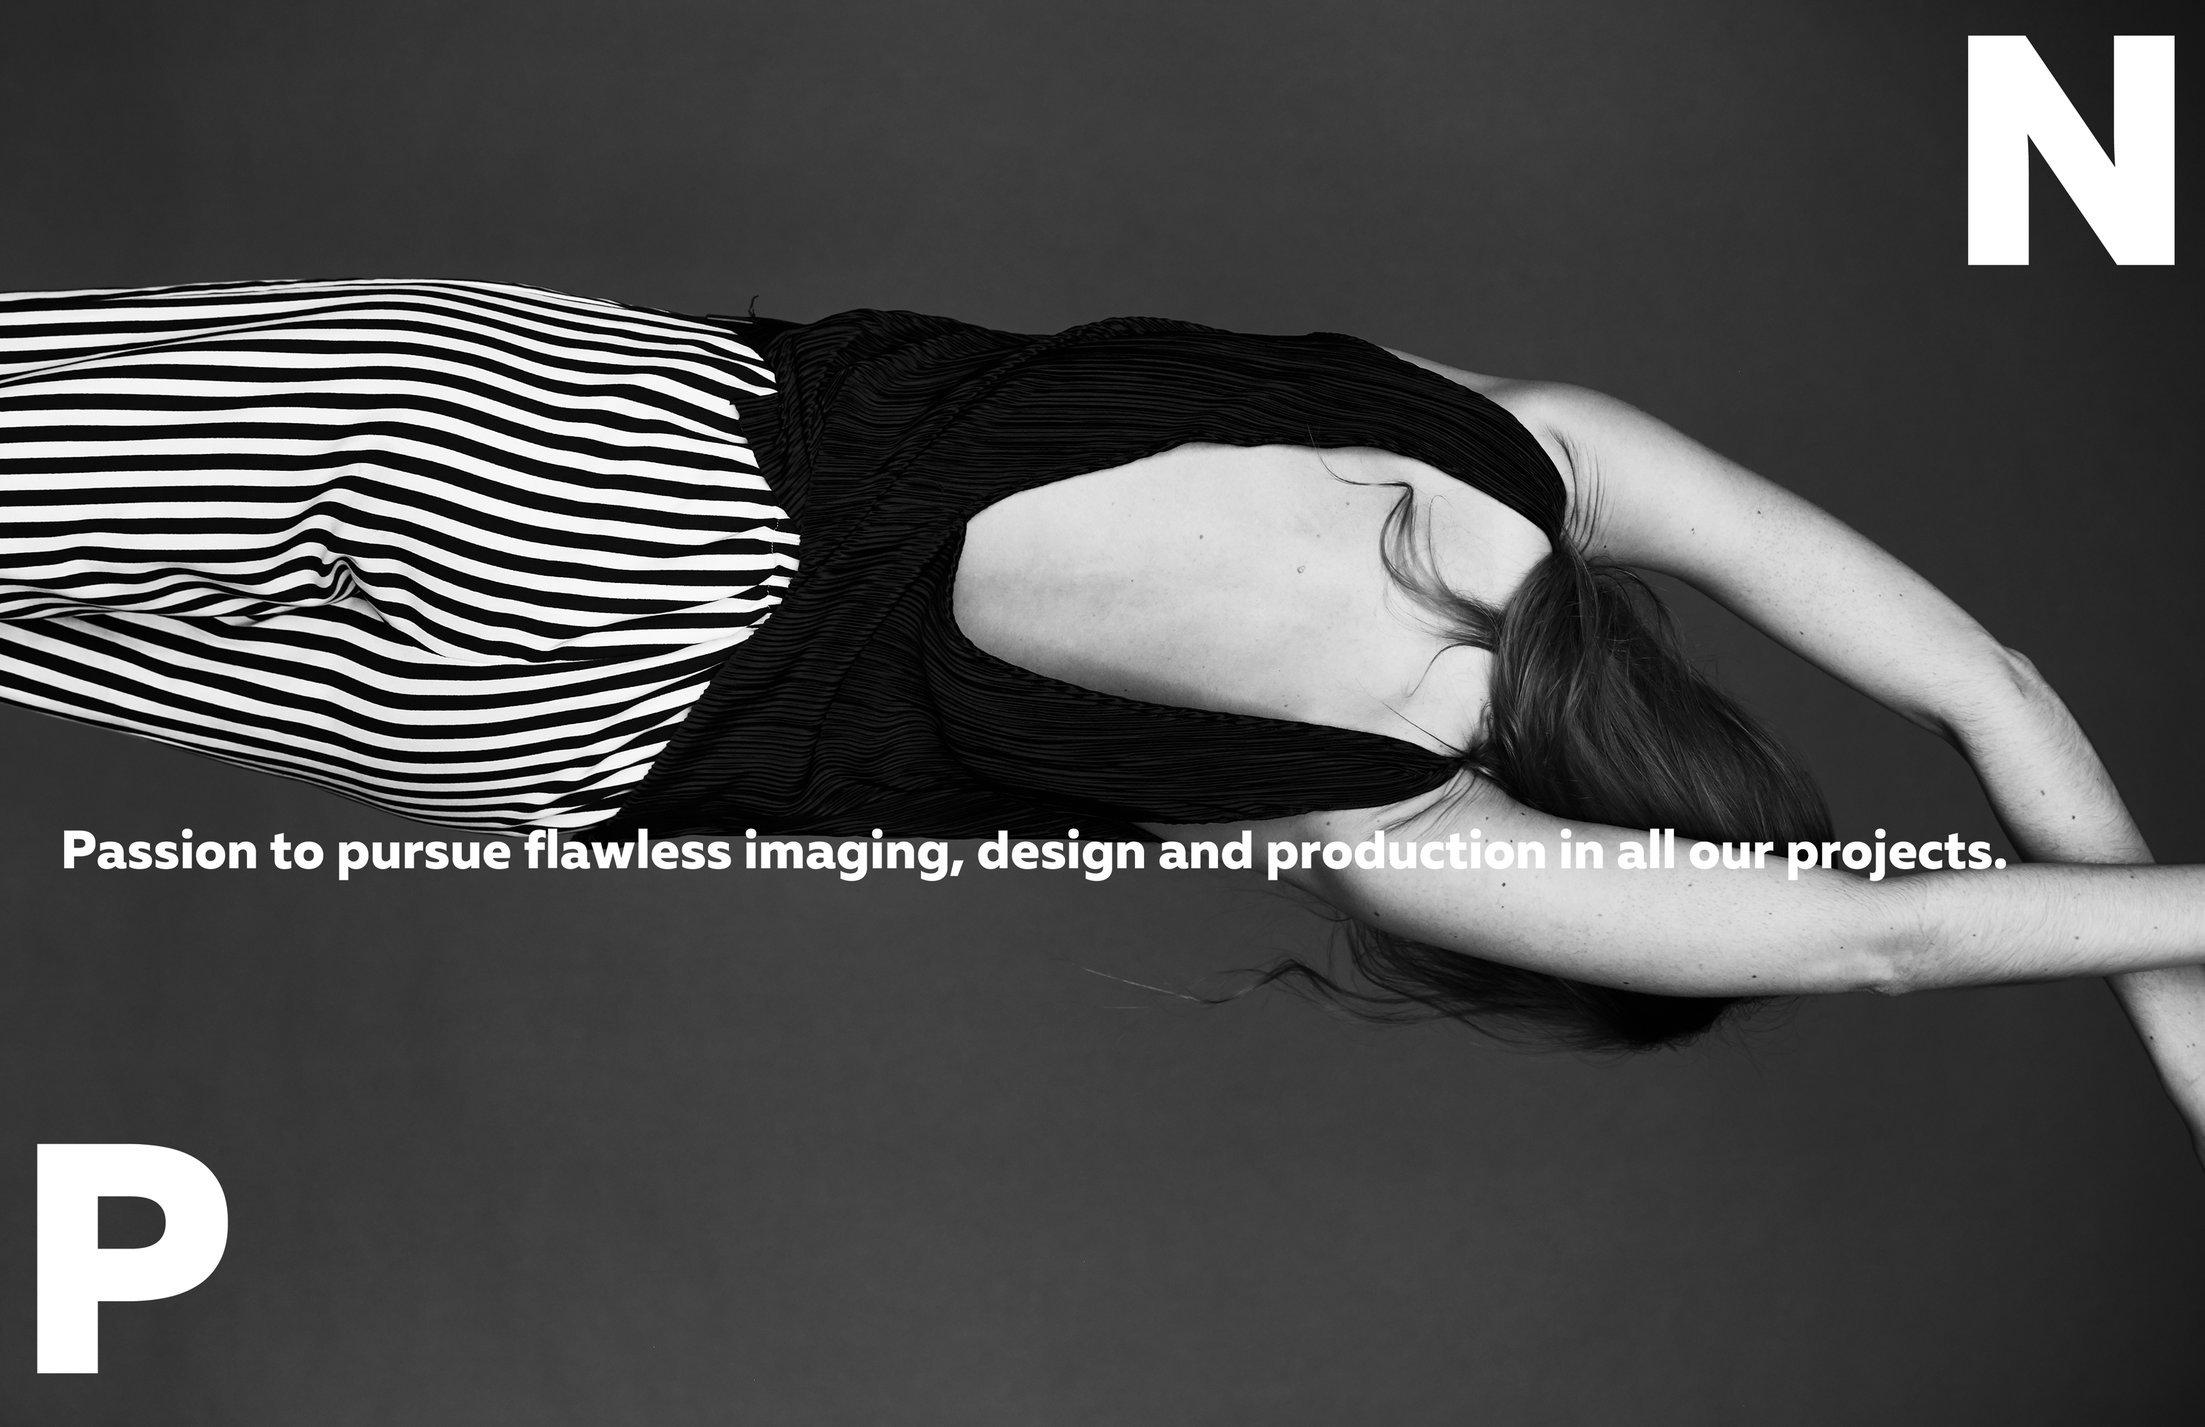 paula_nyc_das_model-fashion-photographer-nico-stipcianos-miami-copy-3.jpg